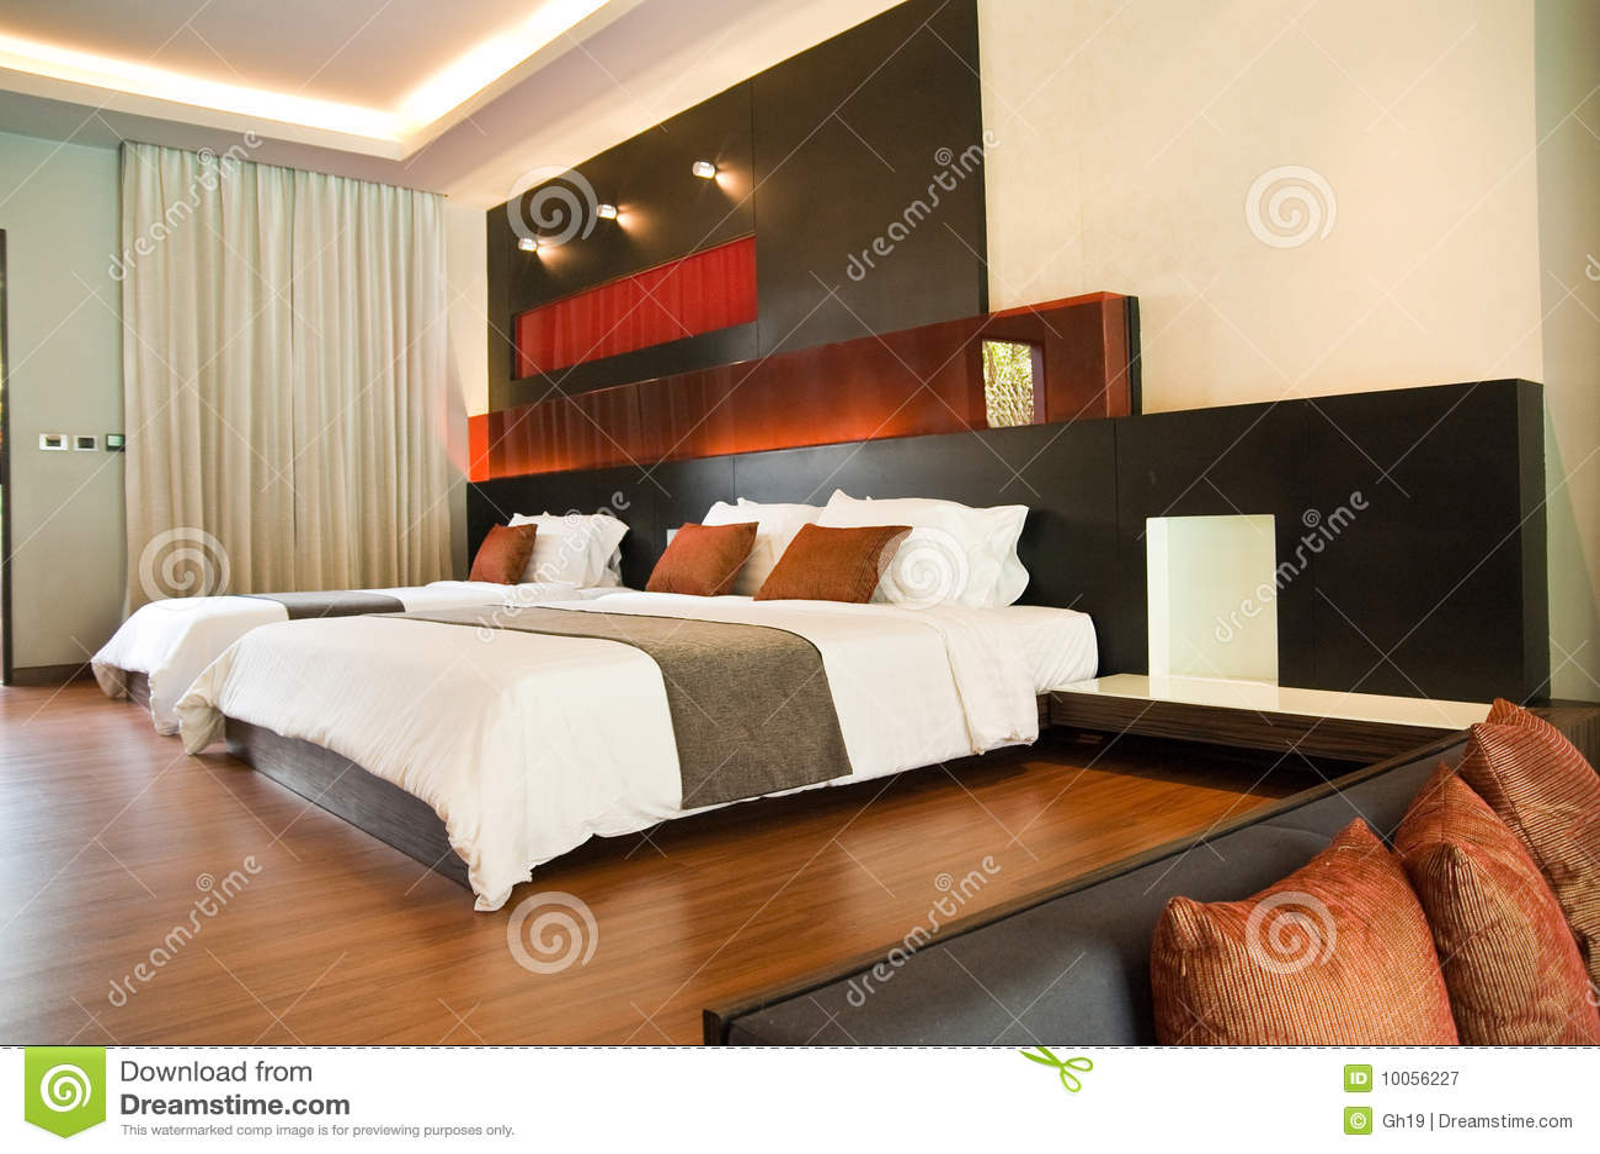 Sleeping room. Sleeping Room Royalty Free Stock Photography   Image  10056227